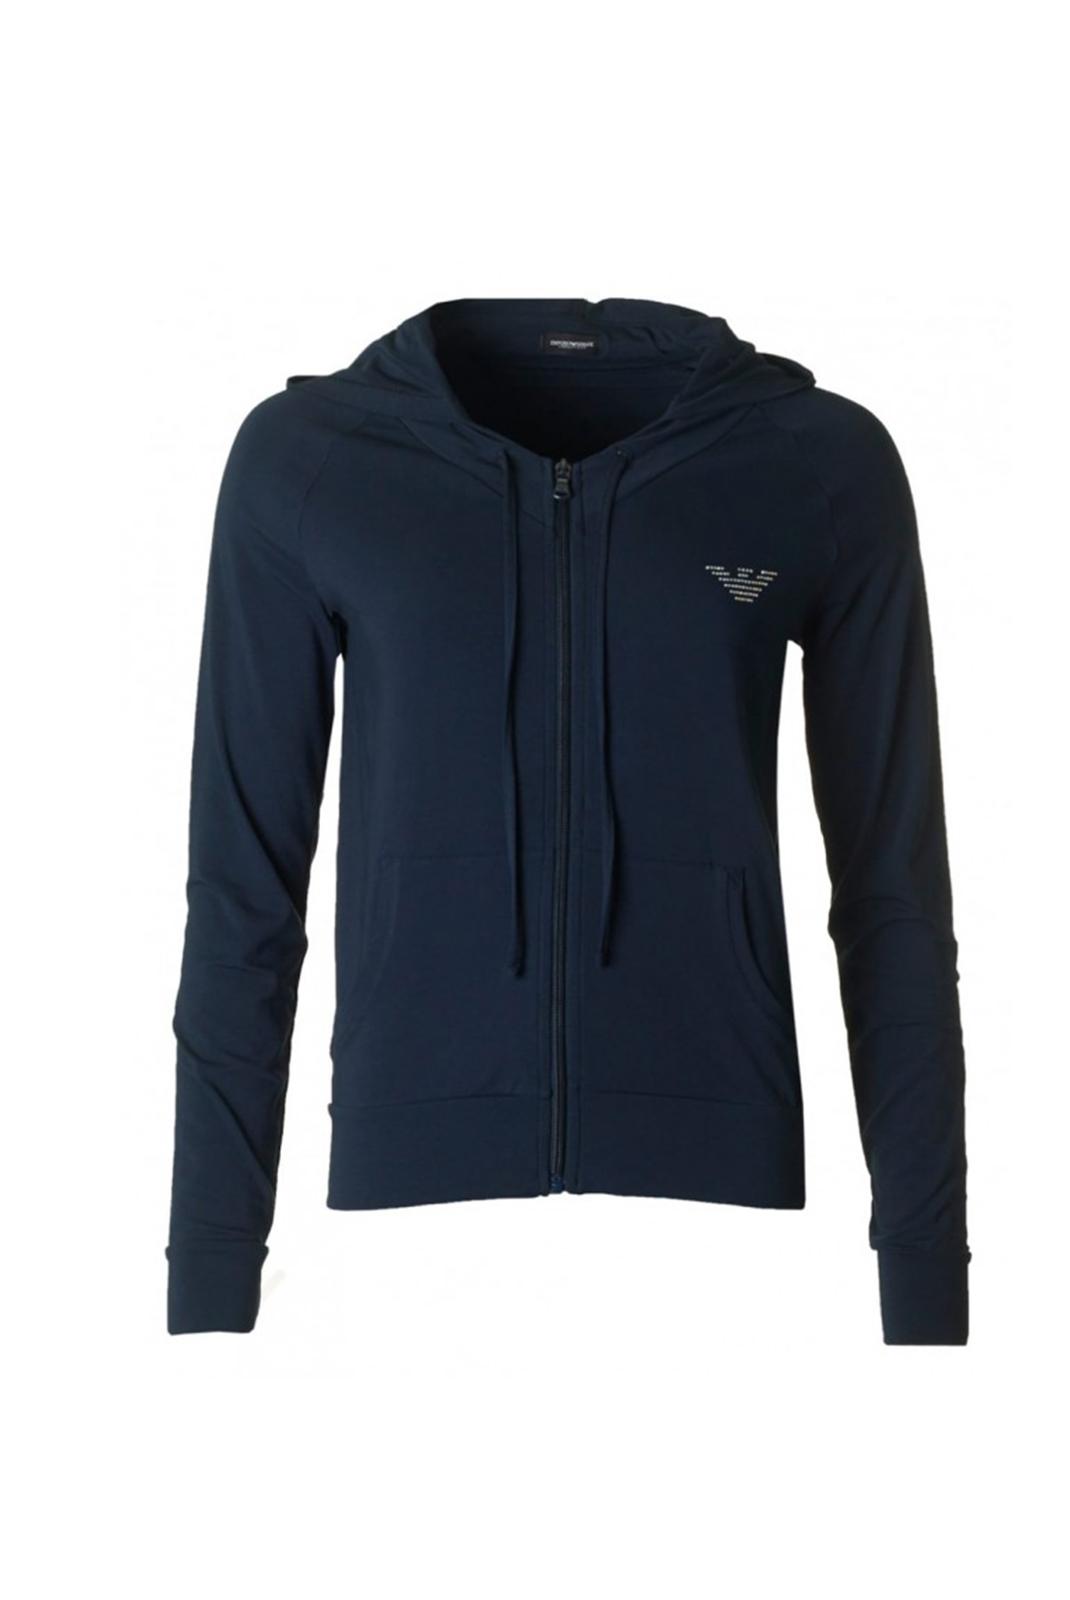 Veste streetwear  Emporio armani 163891 7P263 00135 BLUE